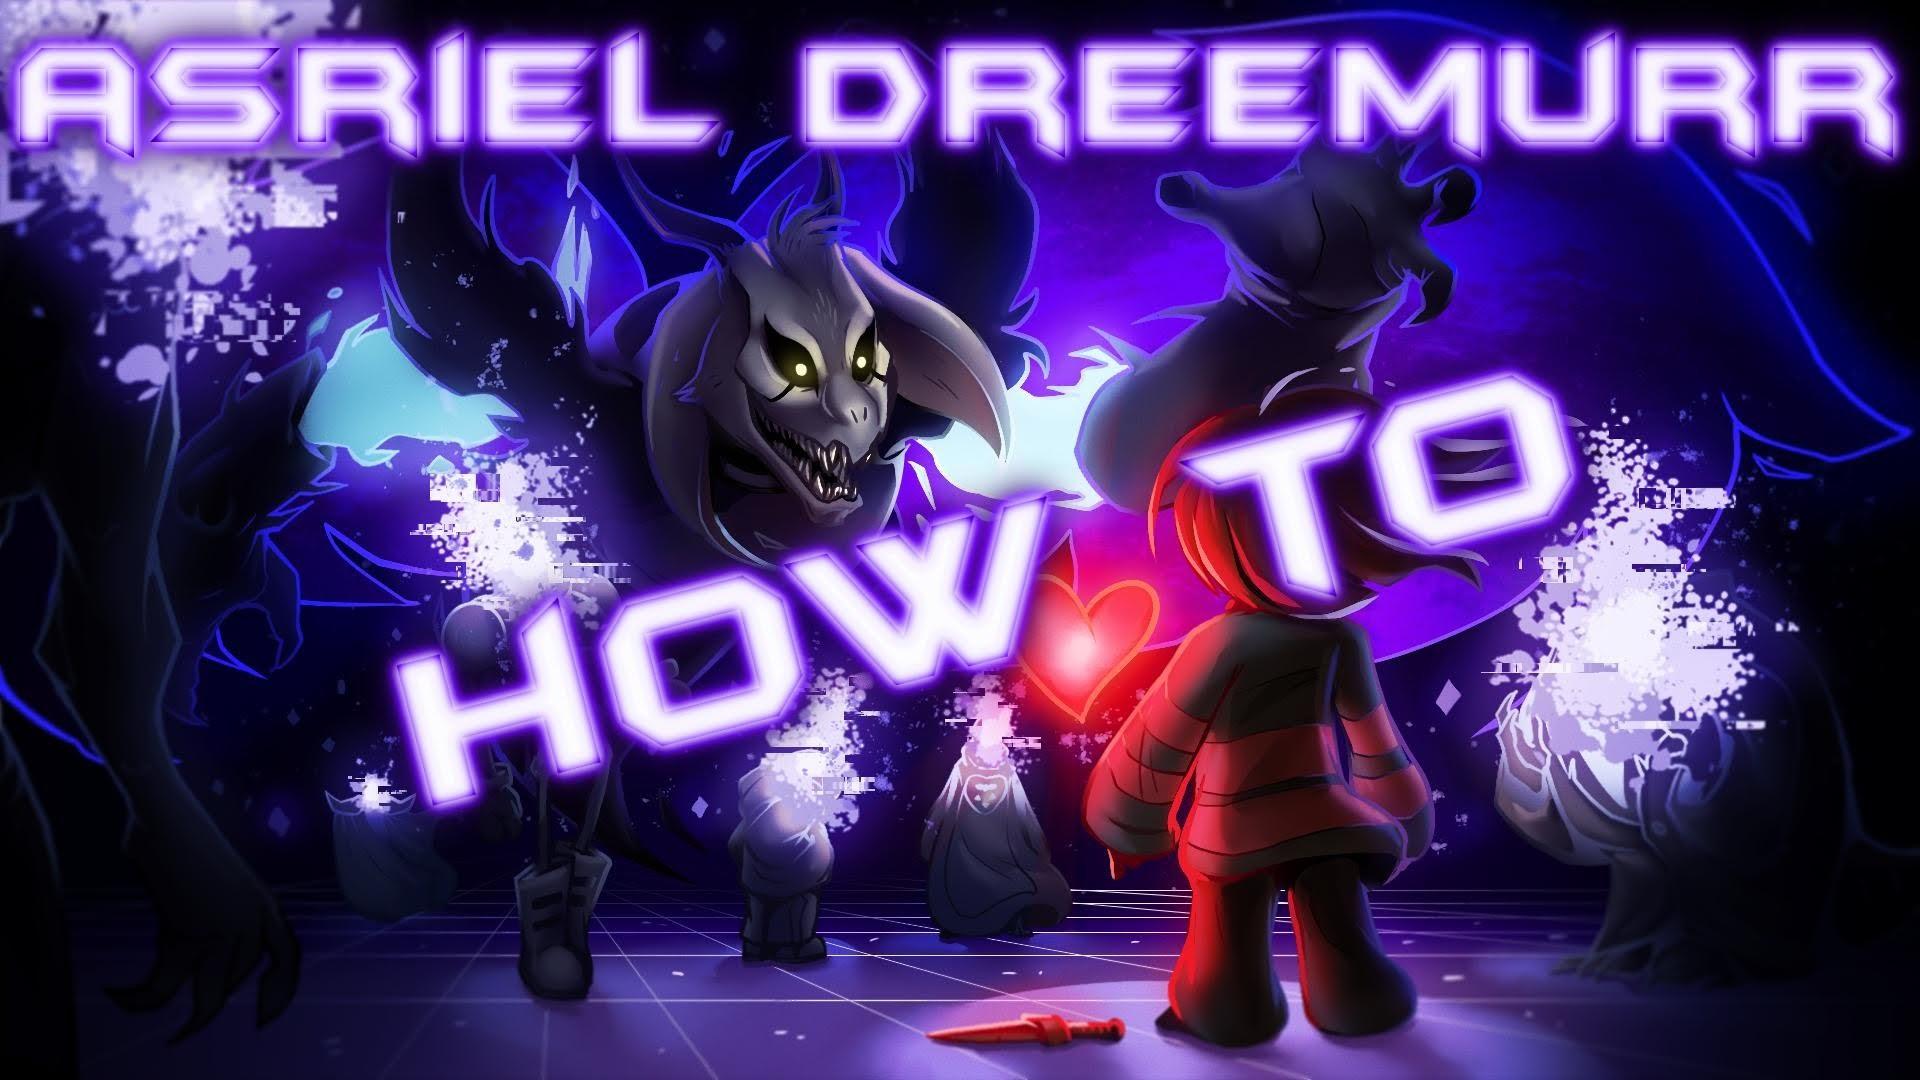 [Undertale] How To Asriel Dreemurr | Gameplay | HD